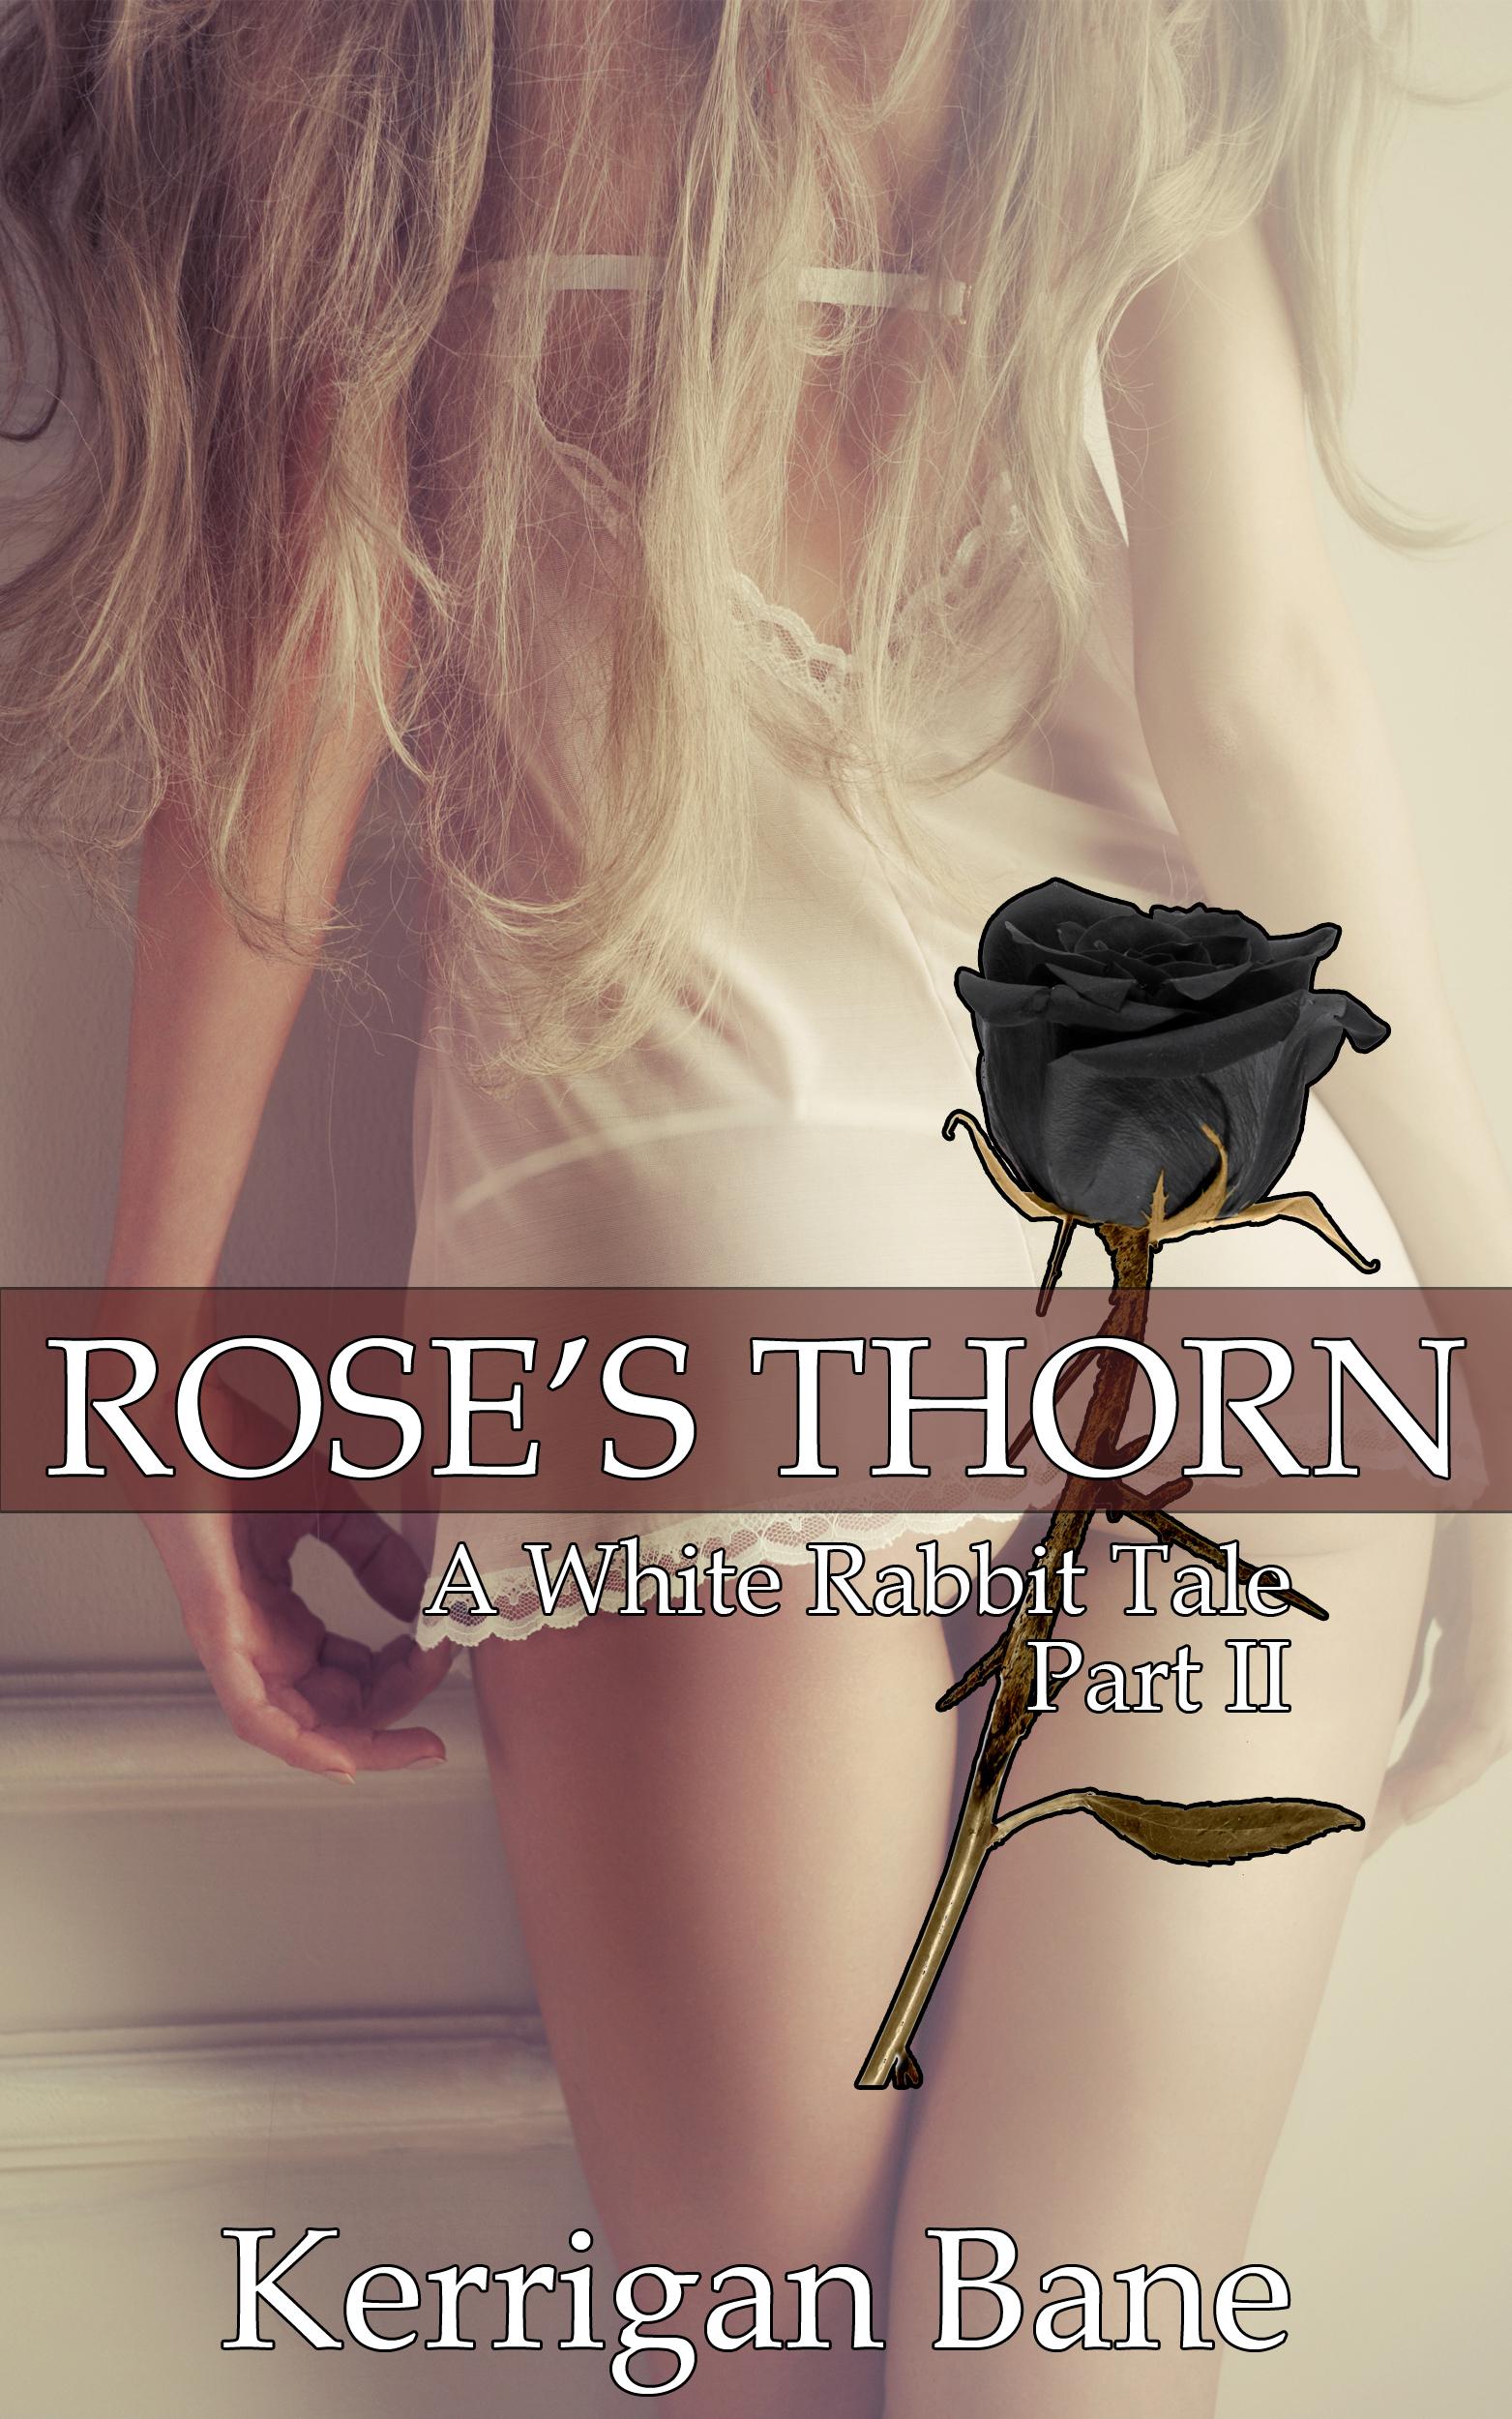 Kerrigan Bane - Rose's Thorn: A White Rabbit Tale (Part II)